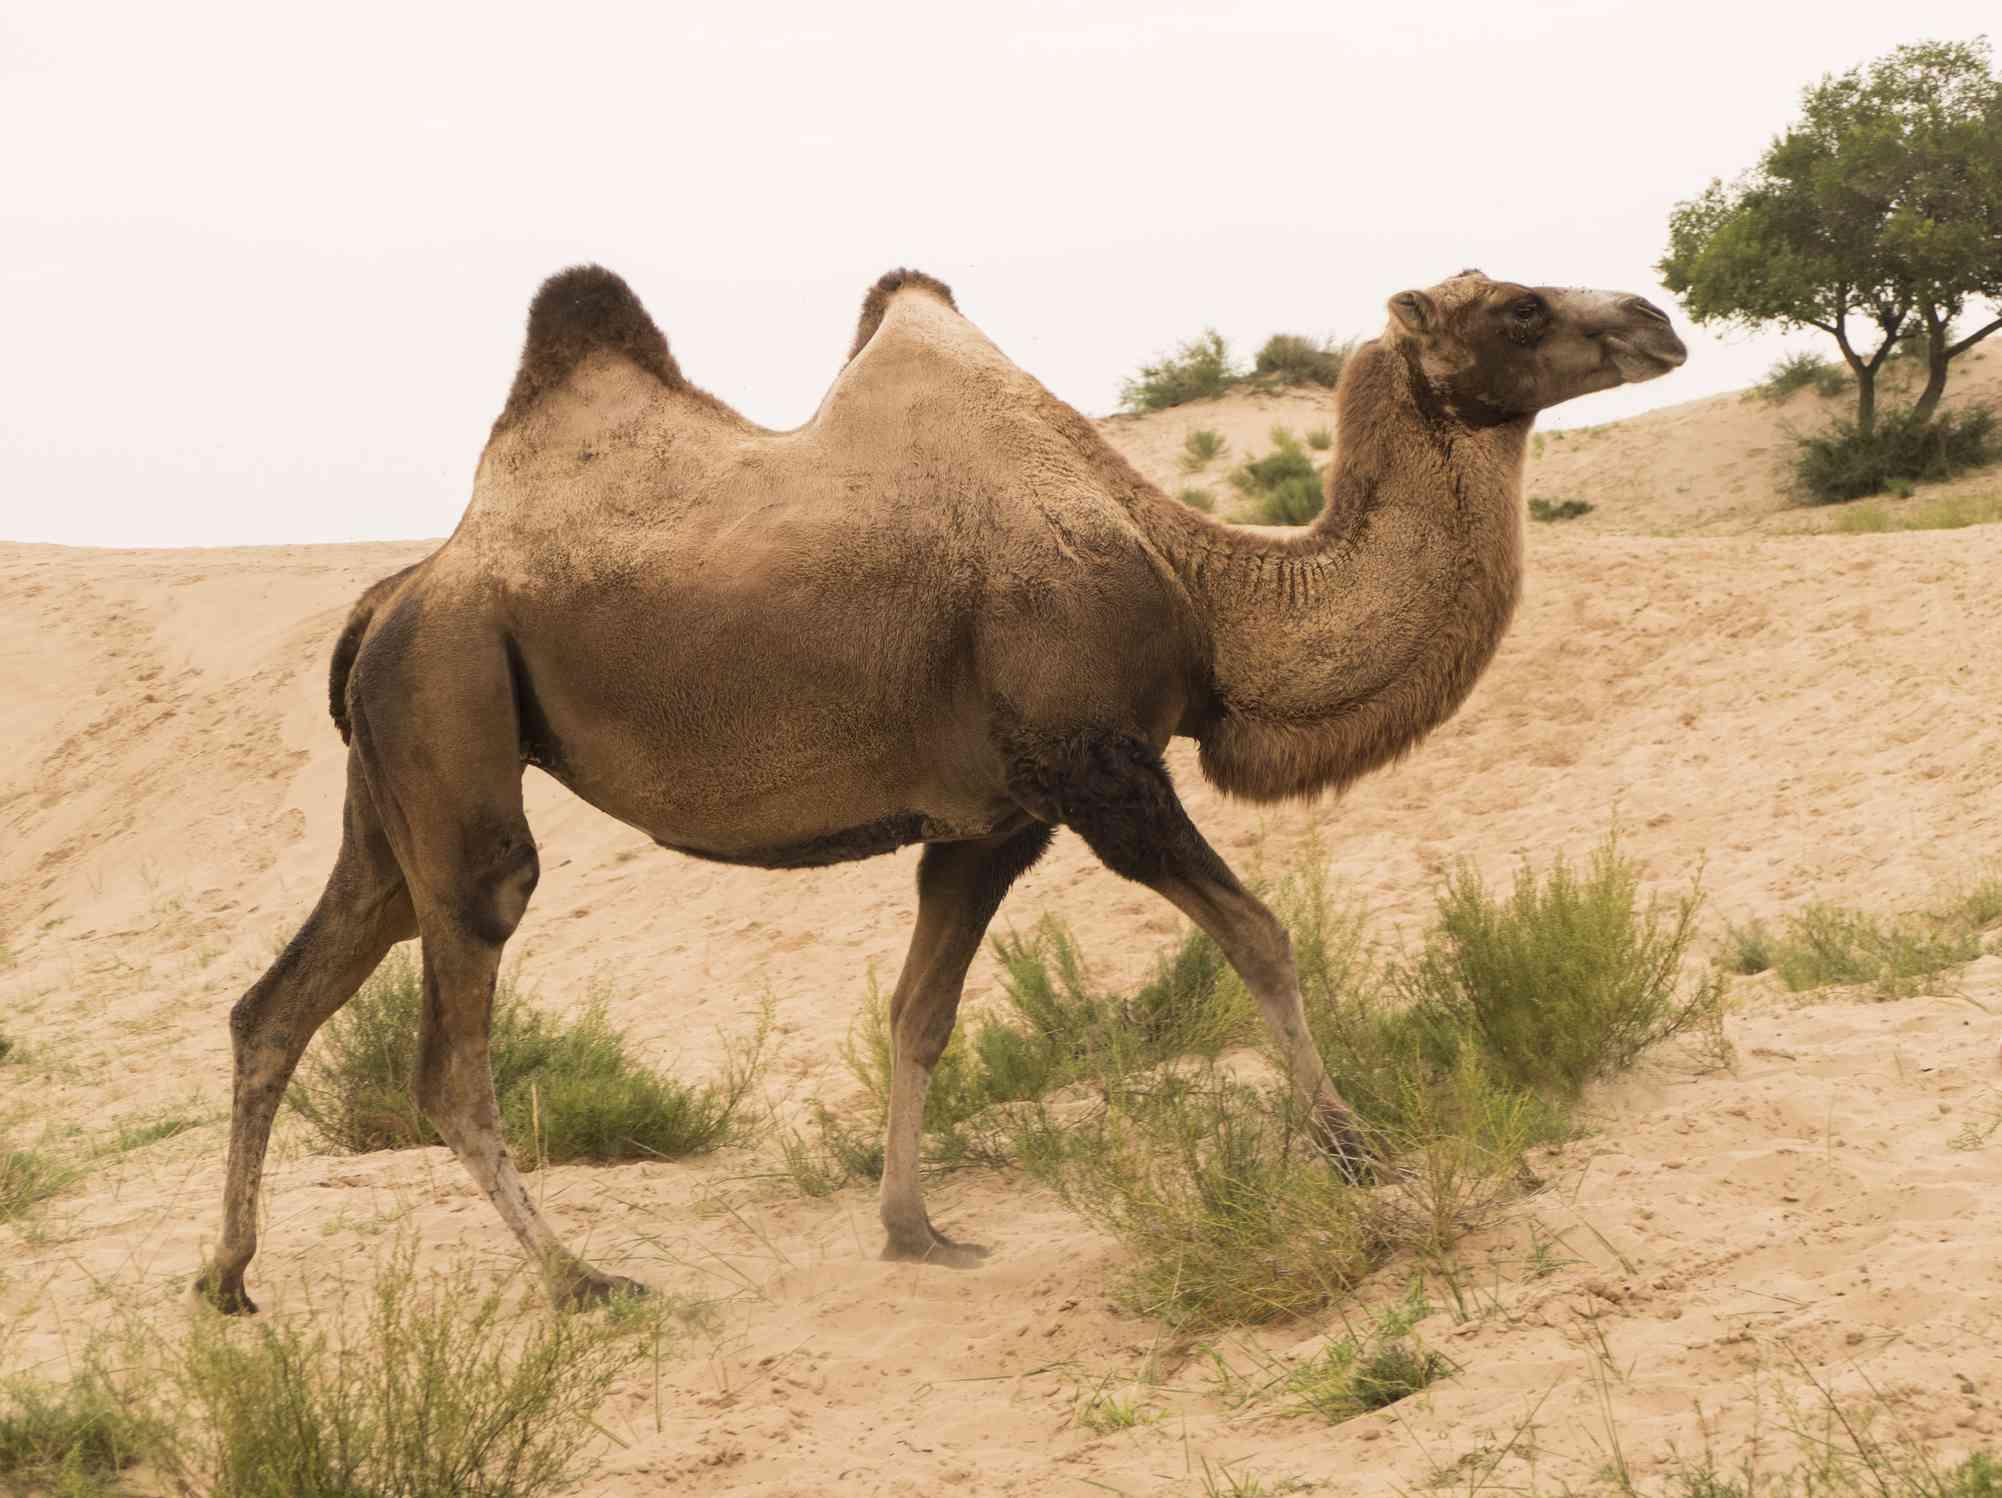 Wild Bactrian camel walking in the desert